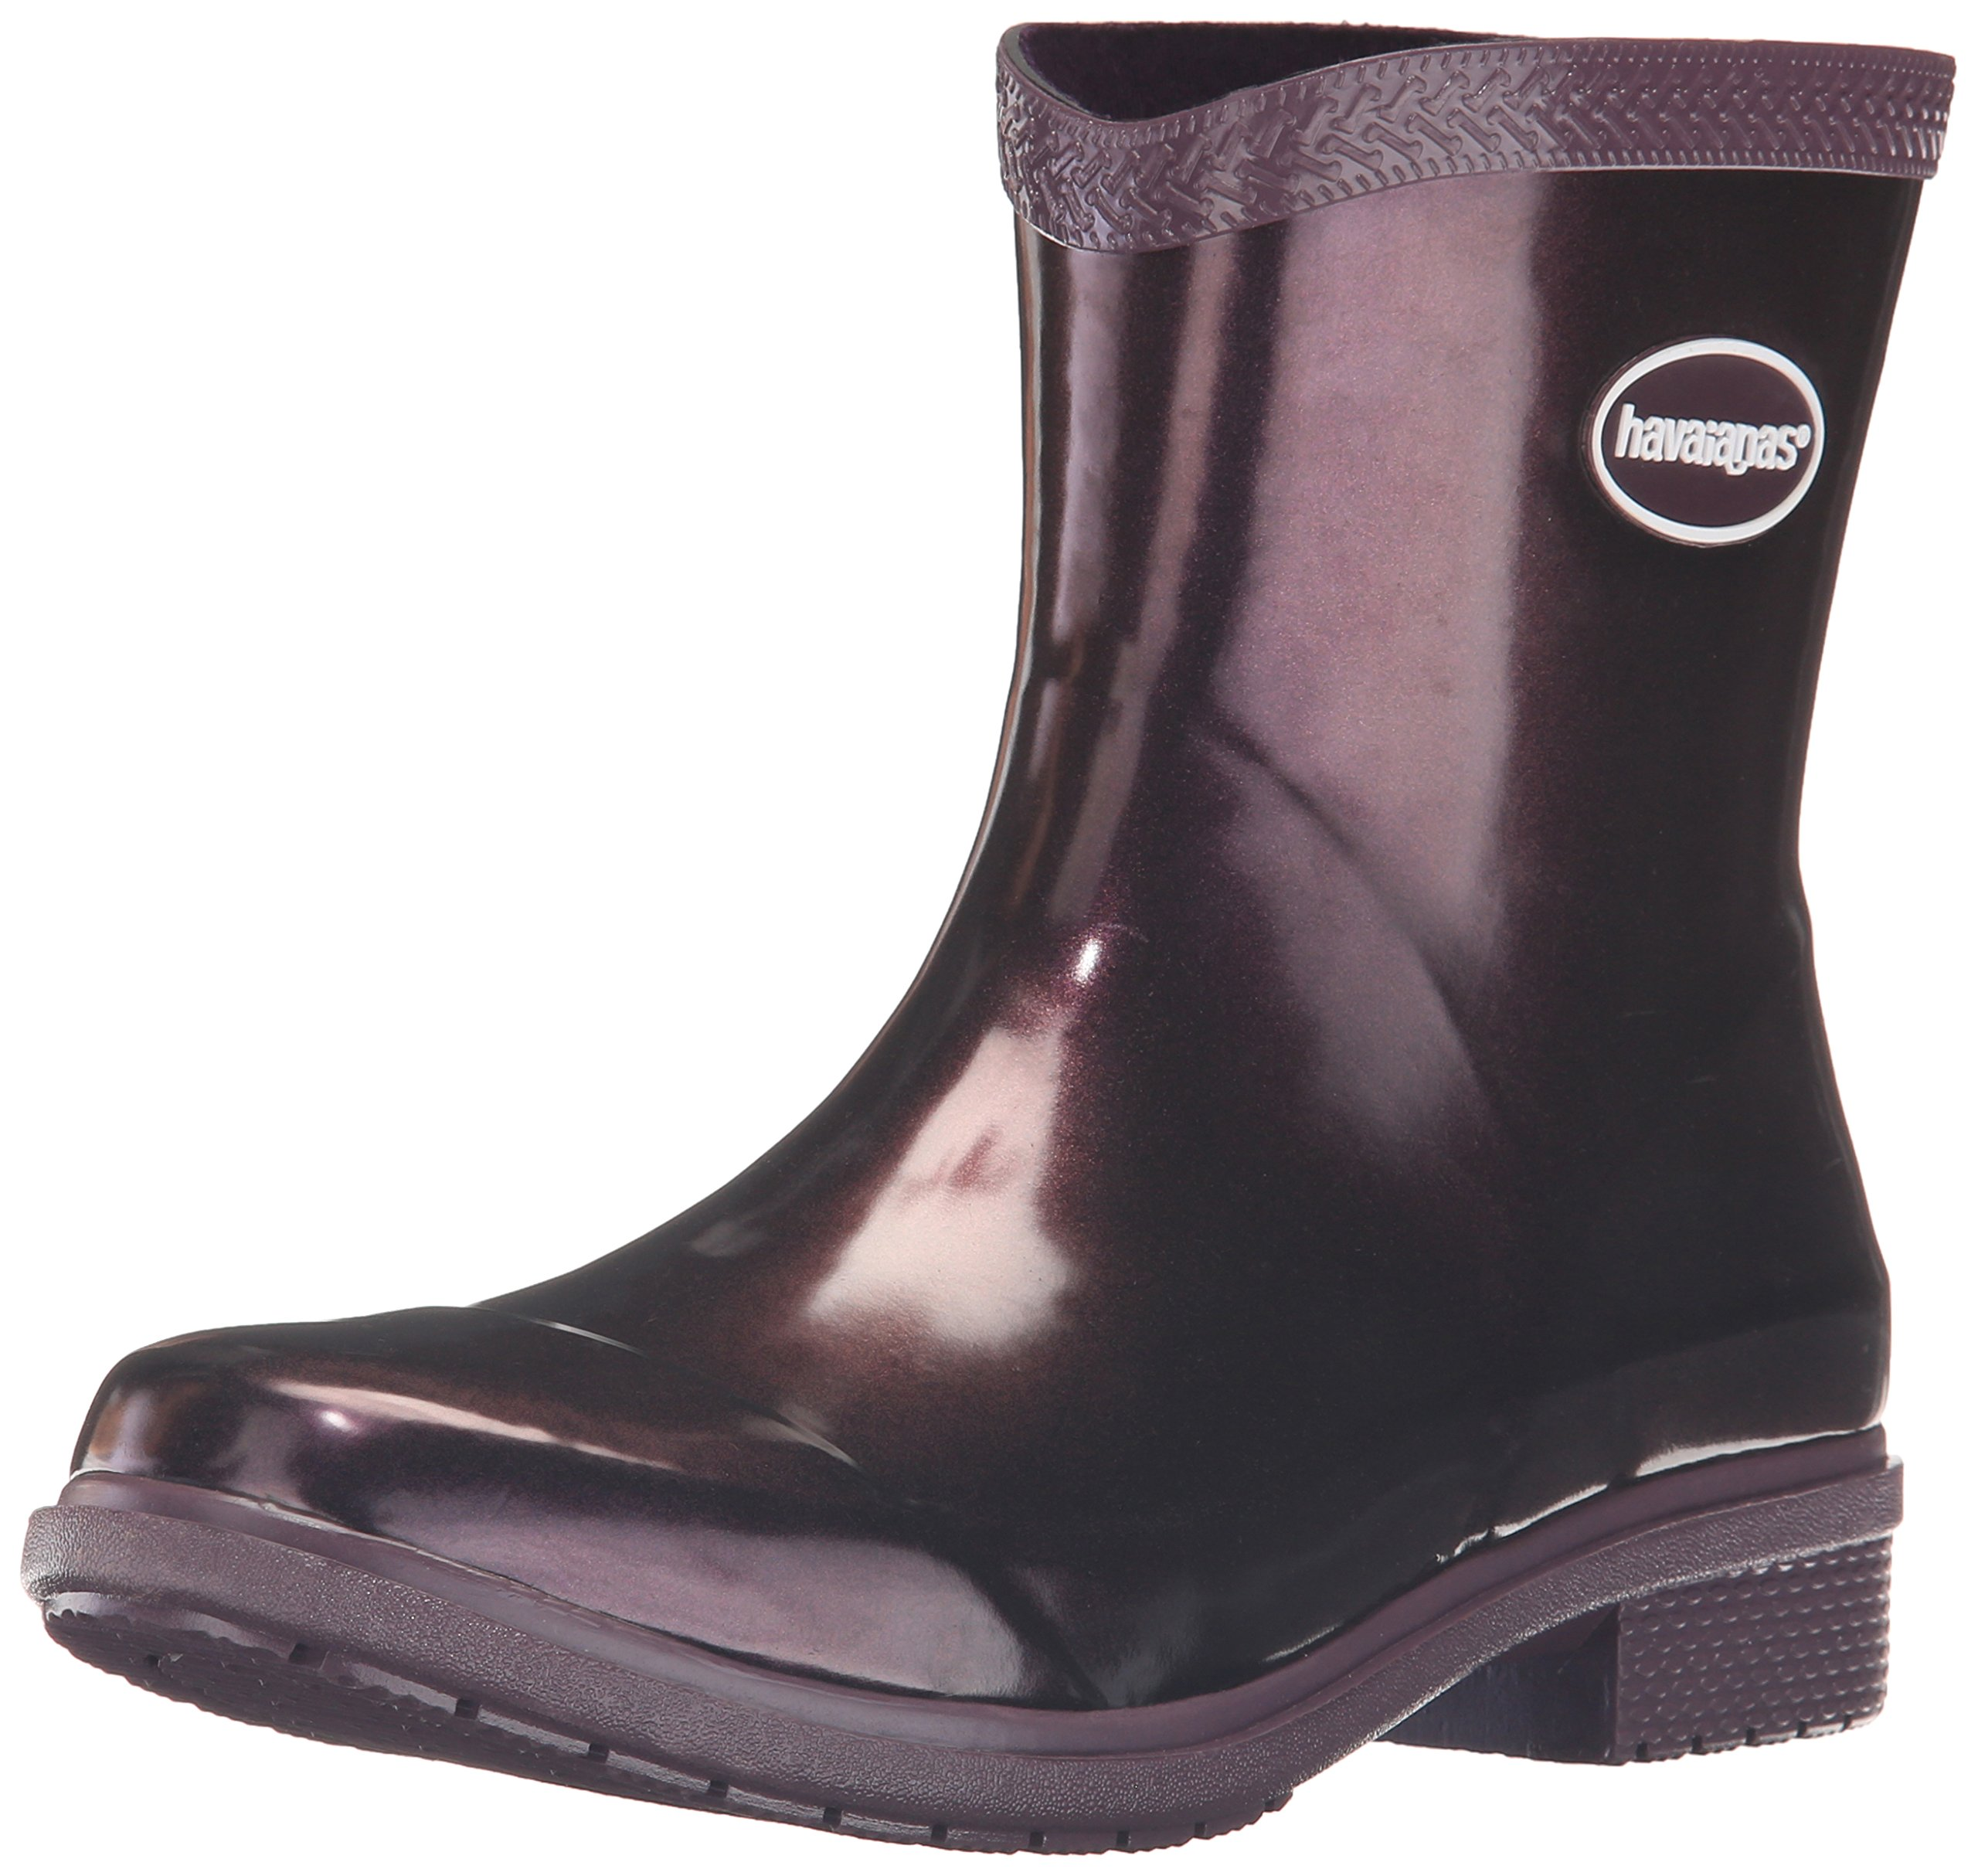 Havaianas Women's Galochas Low Metallic Rain Boots,Aubergine Metallic,35 BR/6 M US